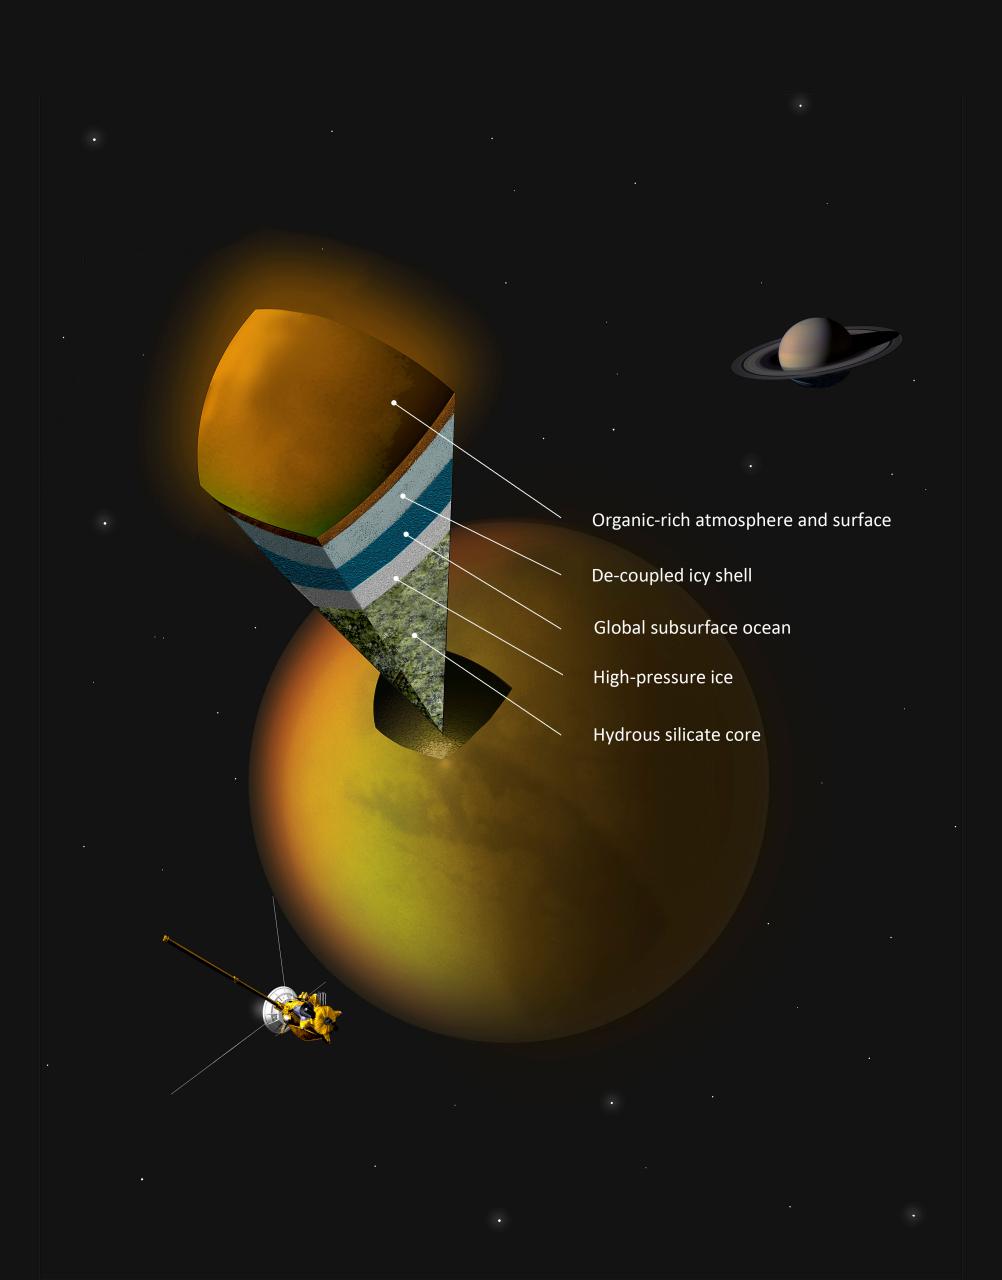 1567217363141-Cassini_Titan_internal-structure_large.jpg